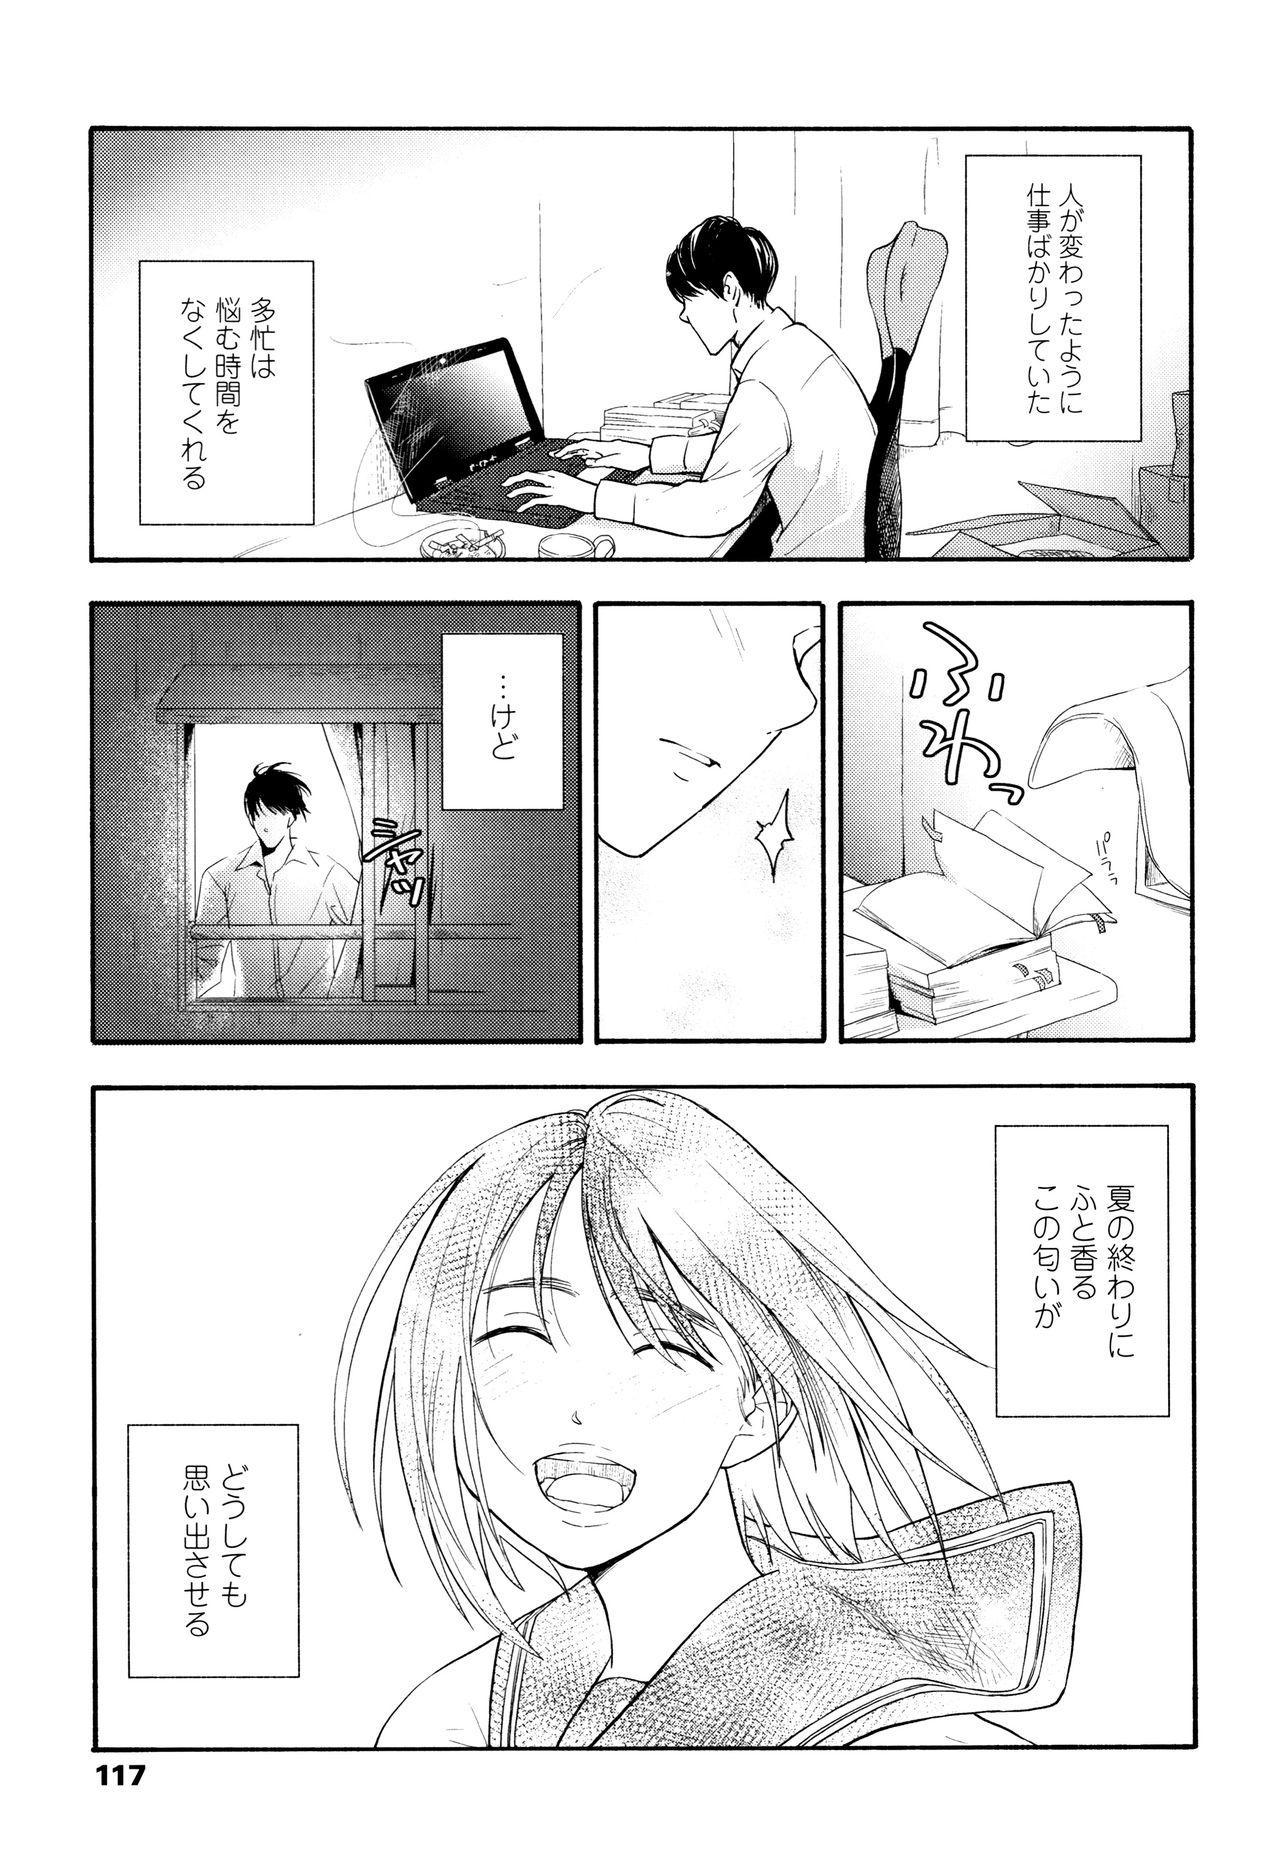 Shishunki no Eros - puberty eros 119